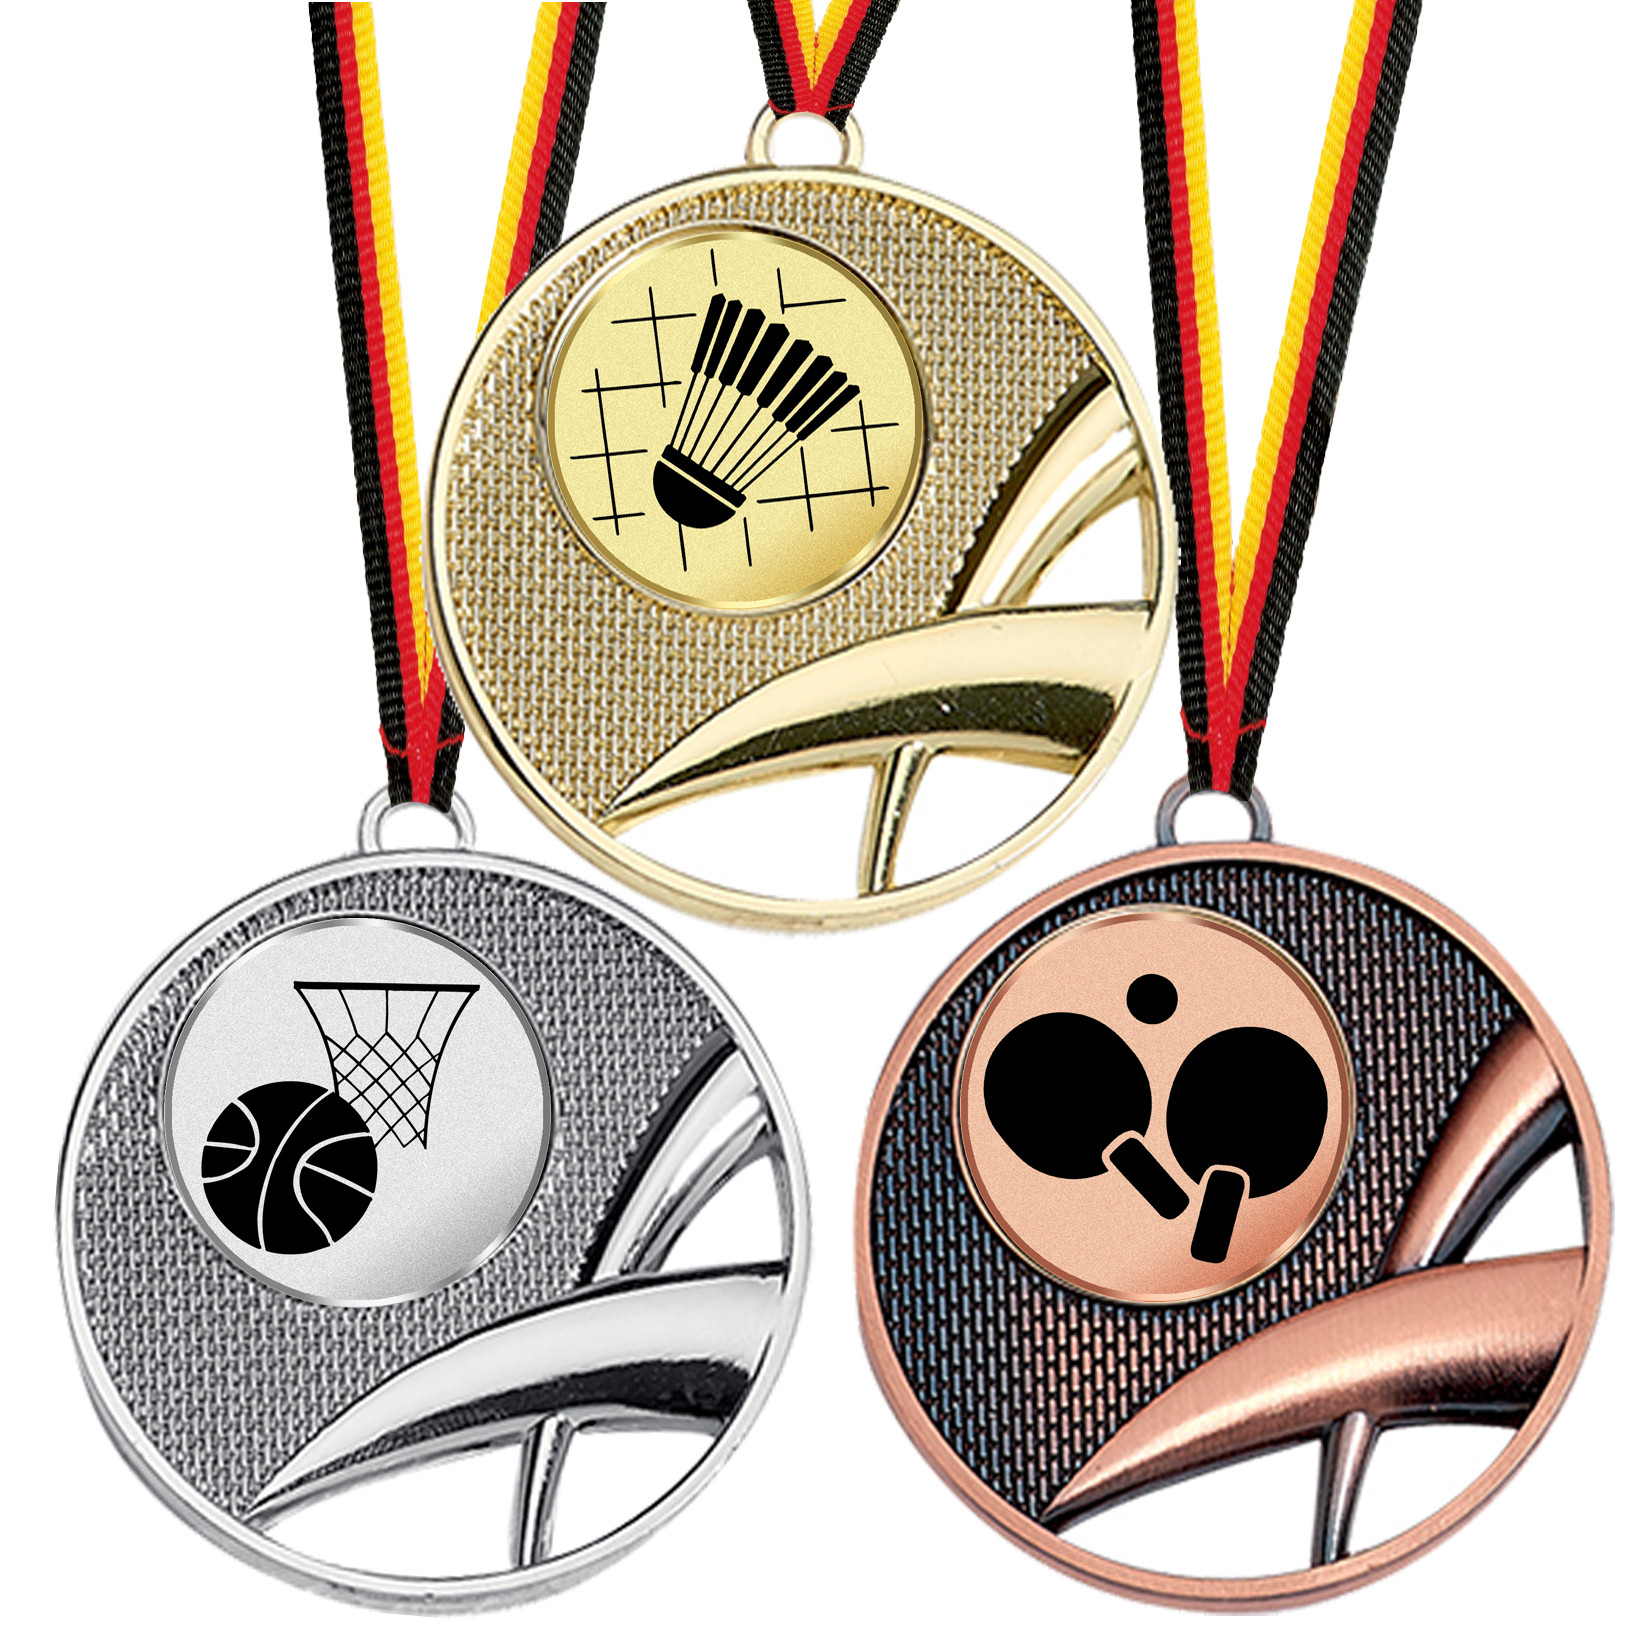 Pokal Emblem Radsport 25 mm//bronze